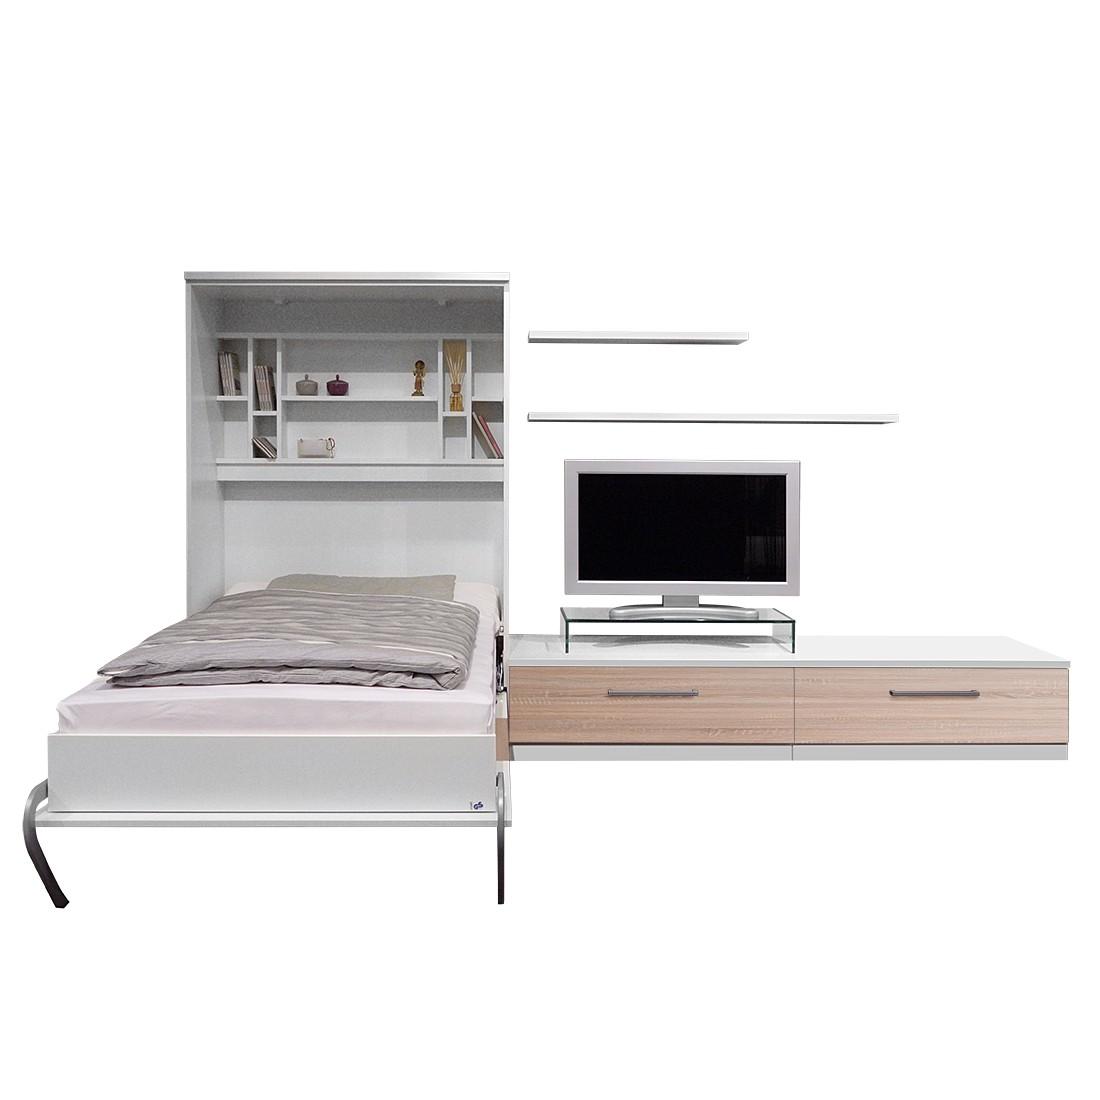 home24 Schrankbett-Kombination Majano | Schlafzimmer > Betten > Schrankbetten